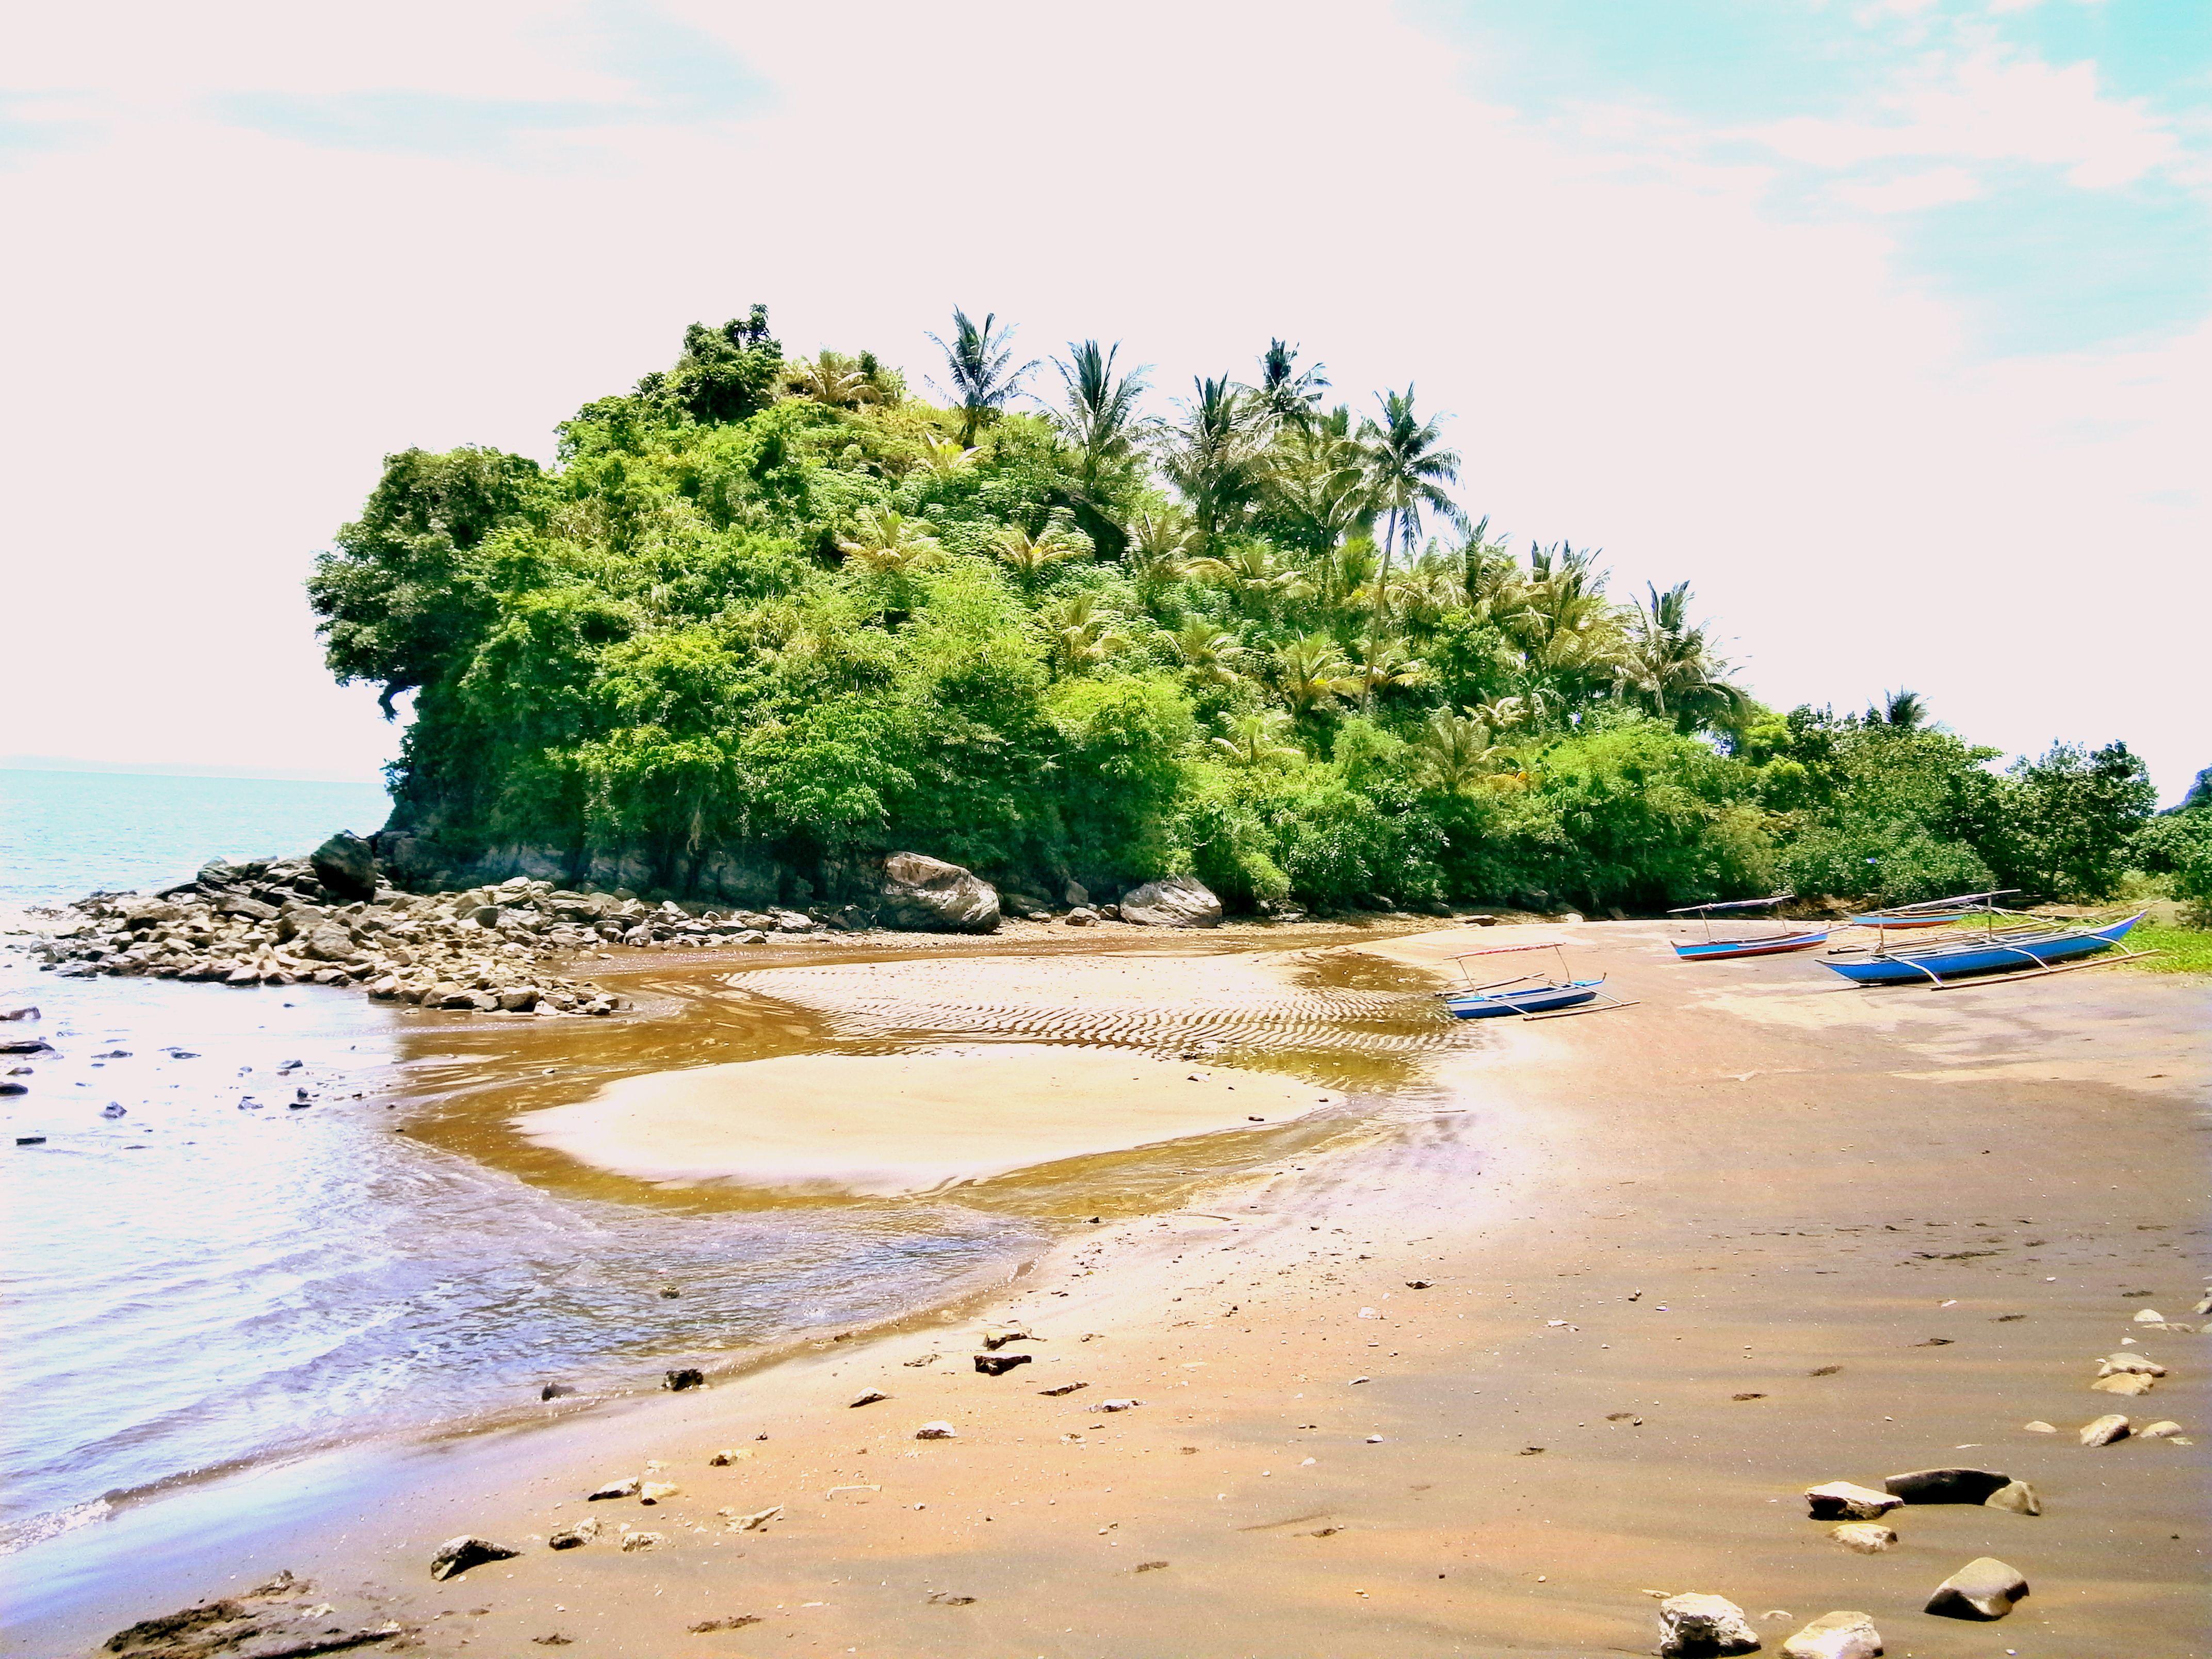 view from 24/7 fun resort, bariis tiwi, albay - bicol | natures